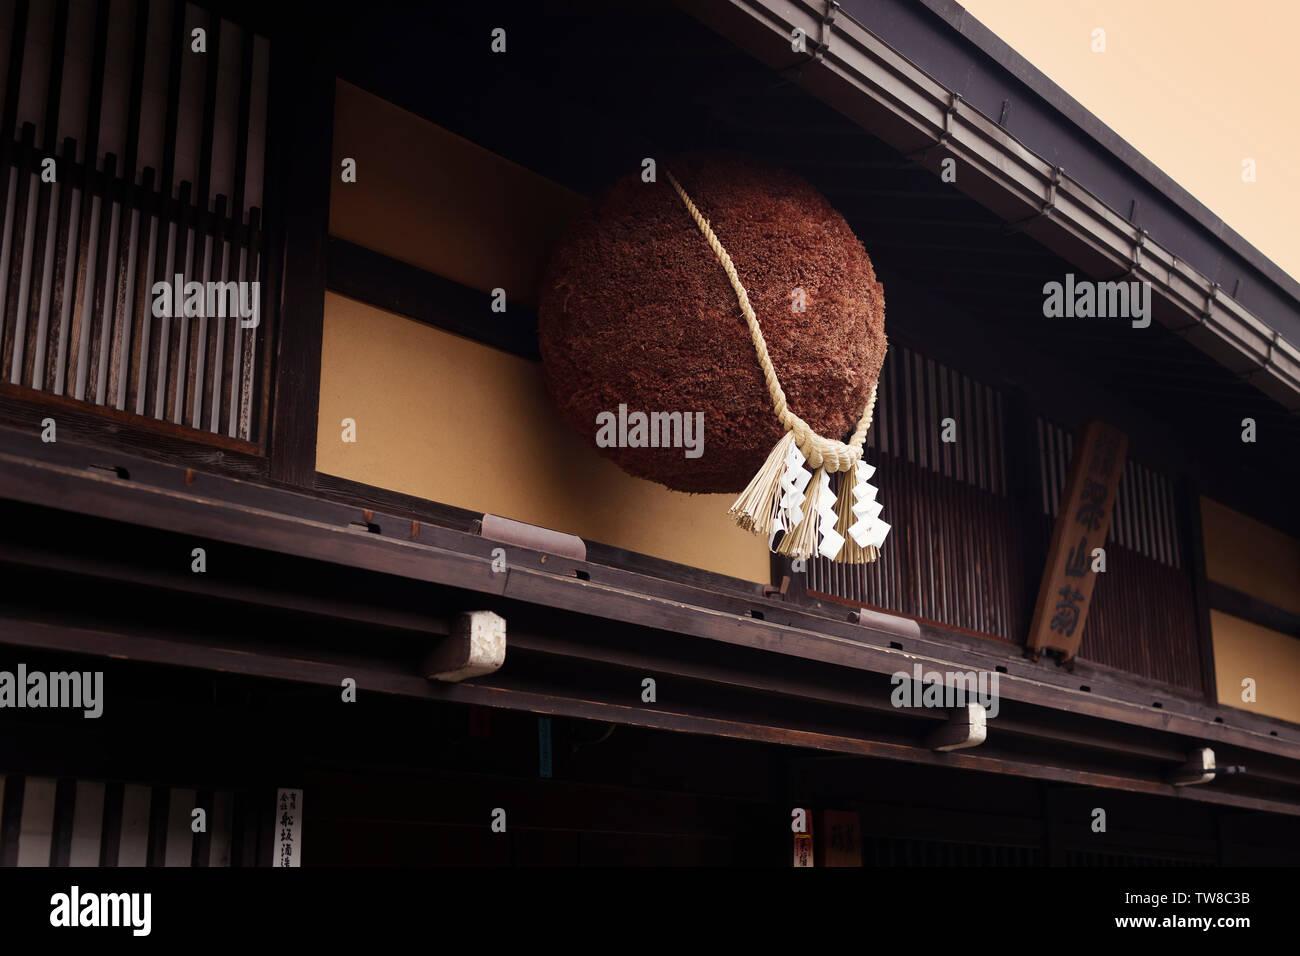 Sugidama, brown cedar ball, or orb, with Shinto Shimenawa rope tied around it, hanging above the entrance of a sake brewery in Takayama, Gifu, Japan - Stock Image